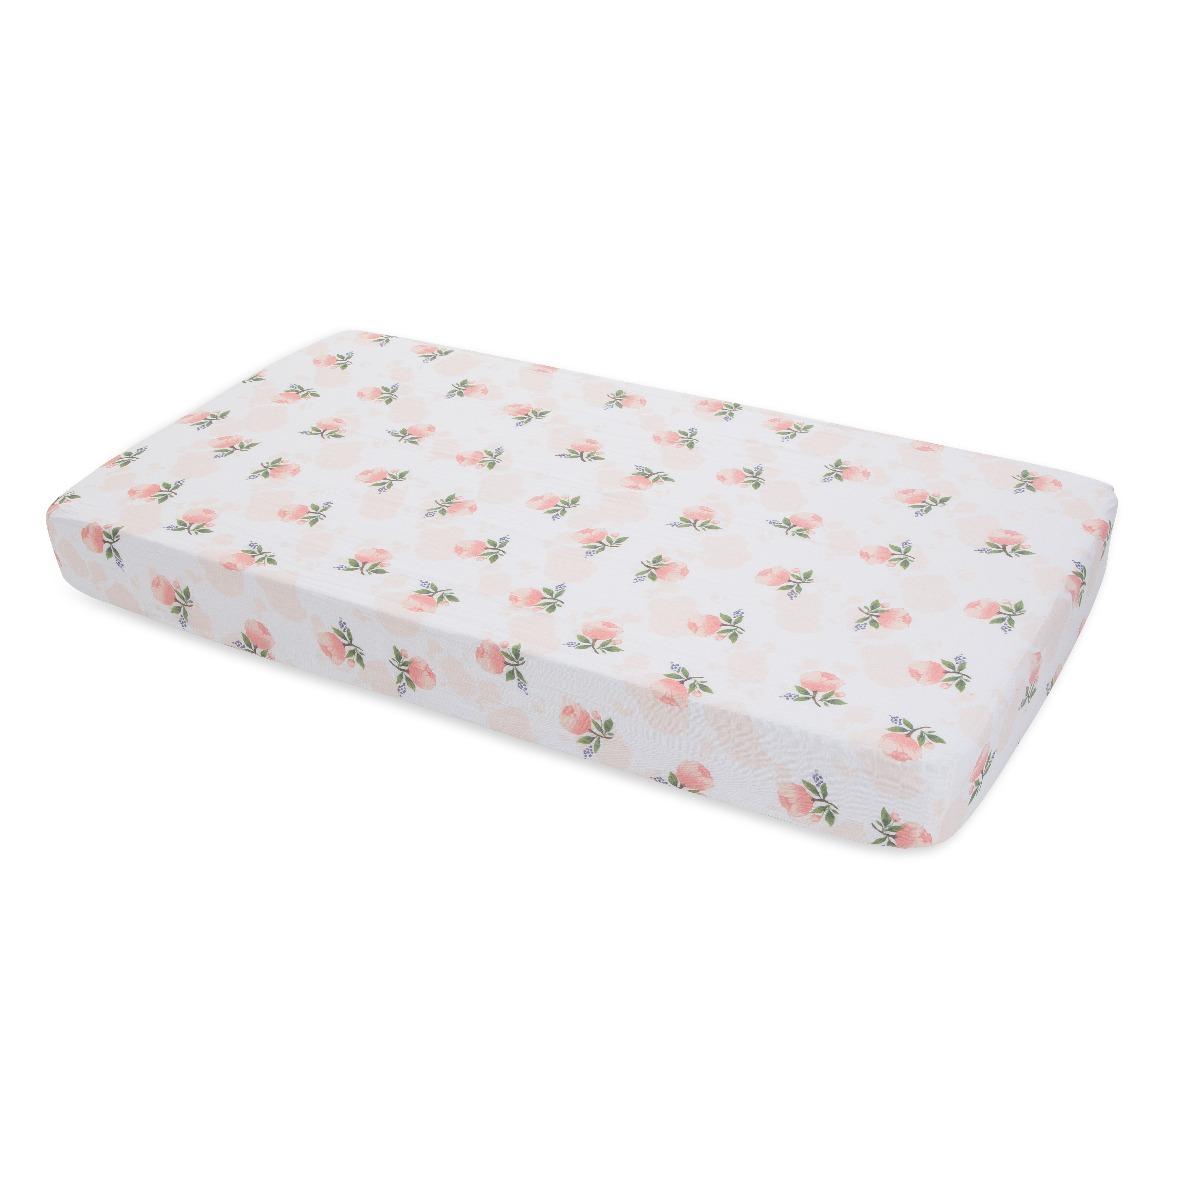 Little Unicorn Cotton Muslin Crib Sheet Water Color Rose